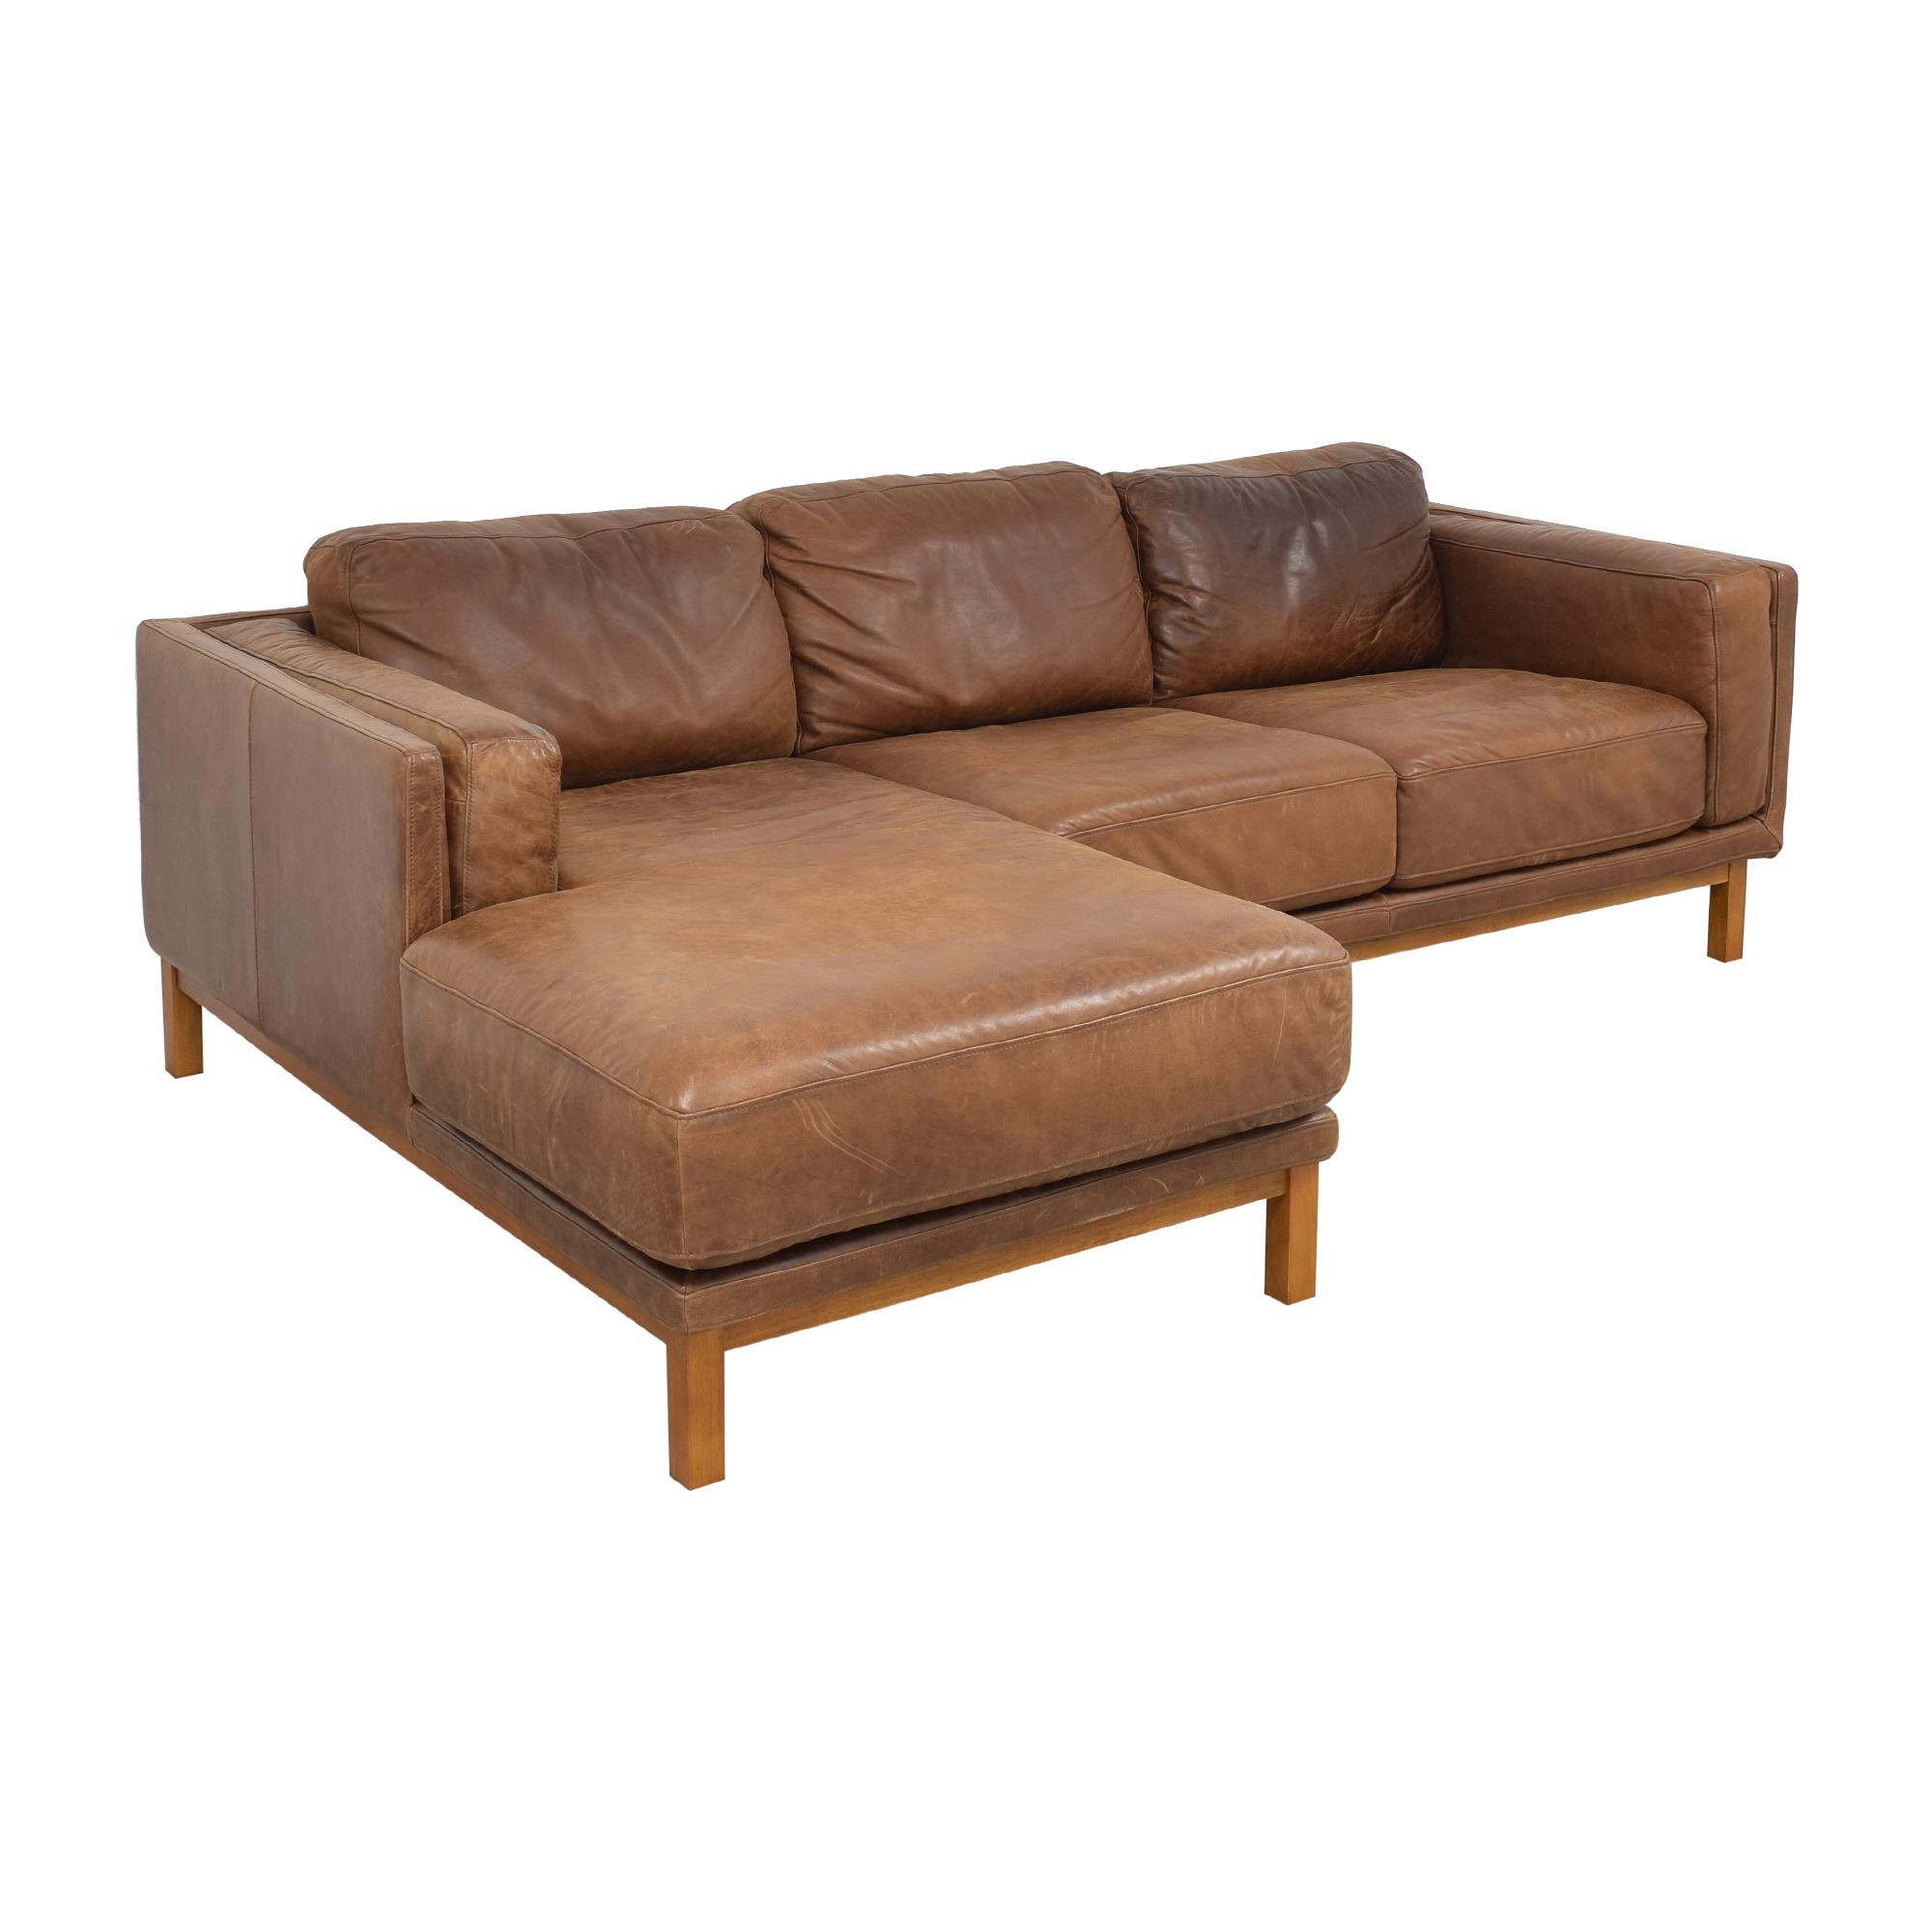 West Elm West Elm Dekalb Leather 2-Piece Chaise Sectional on sale